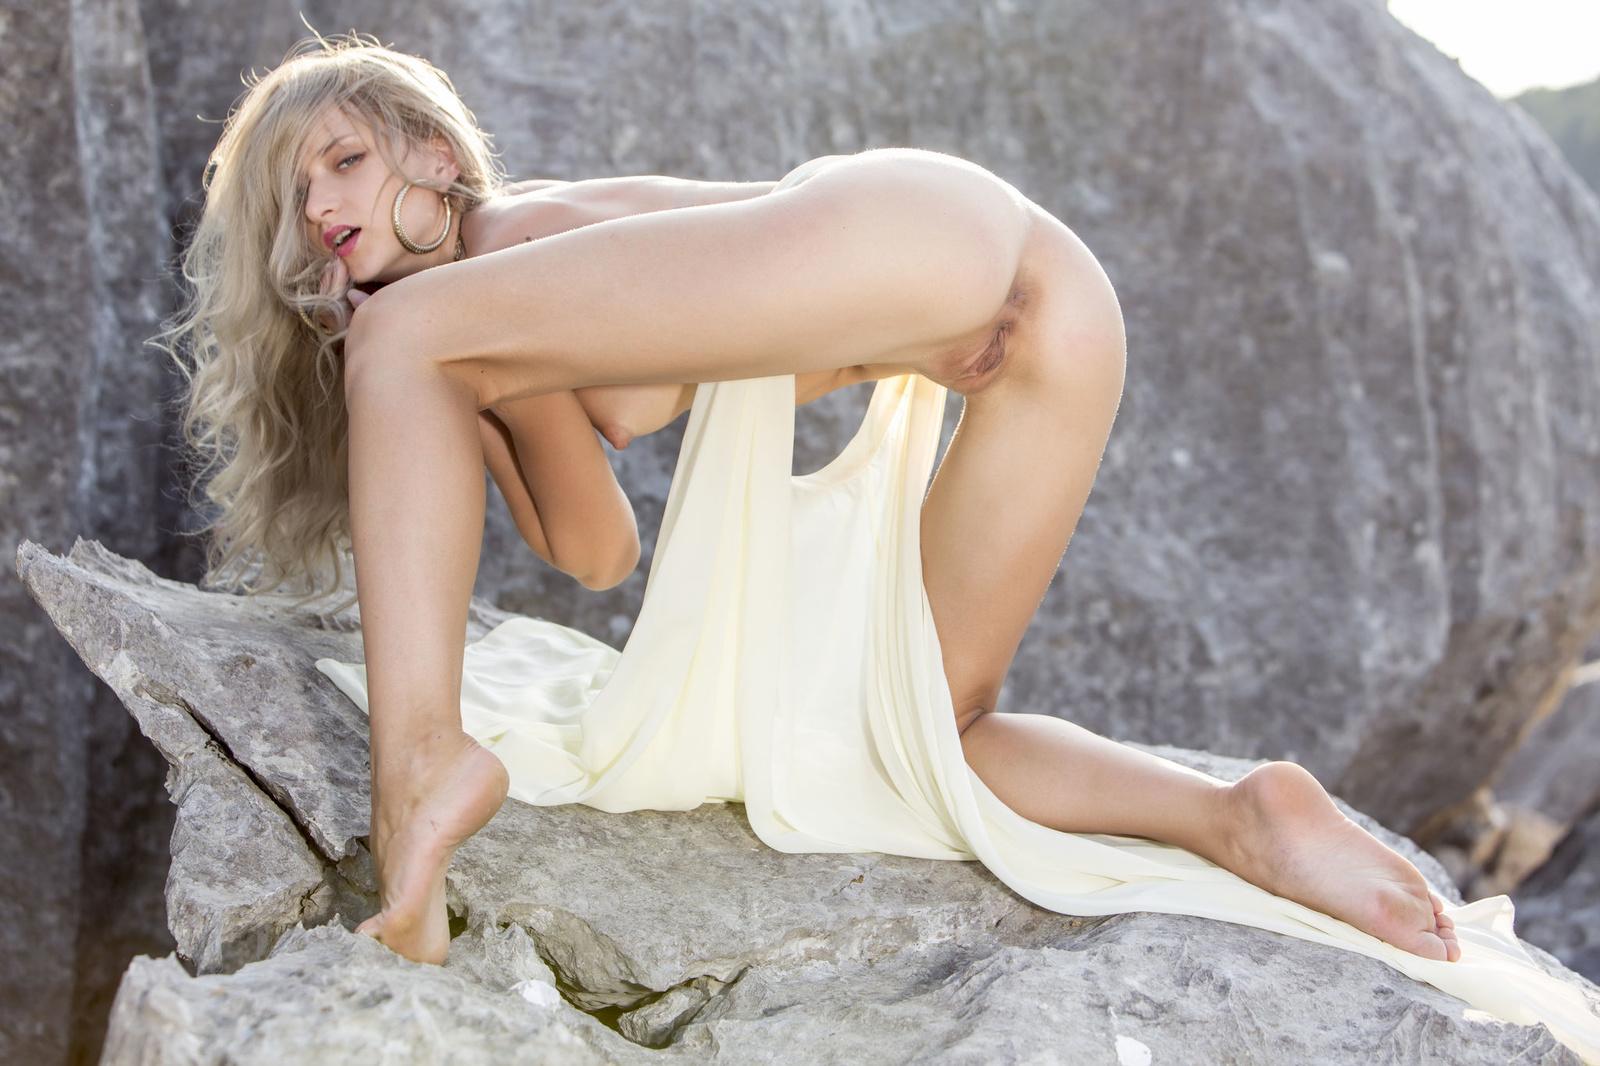 Zdjęcie porno - 09 - Suczka na skale